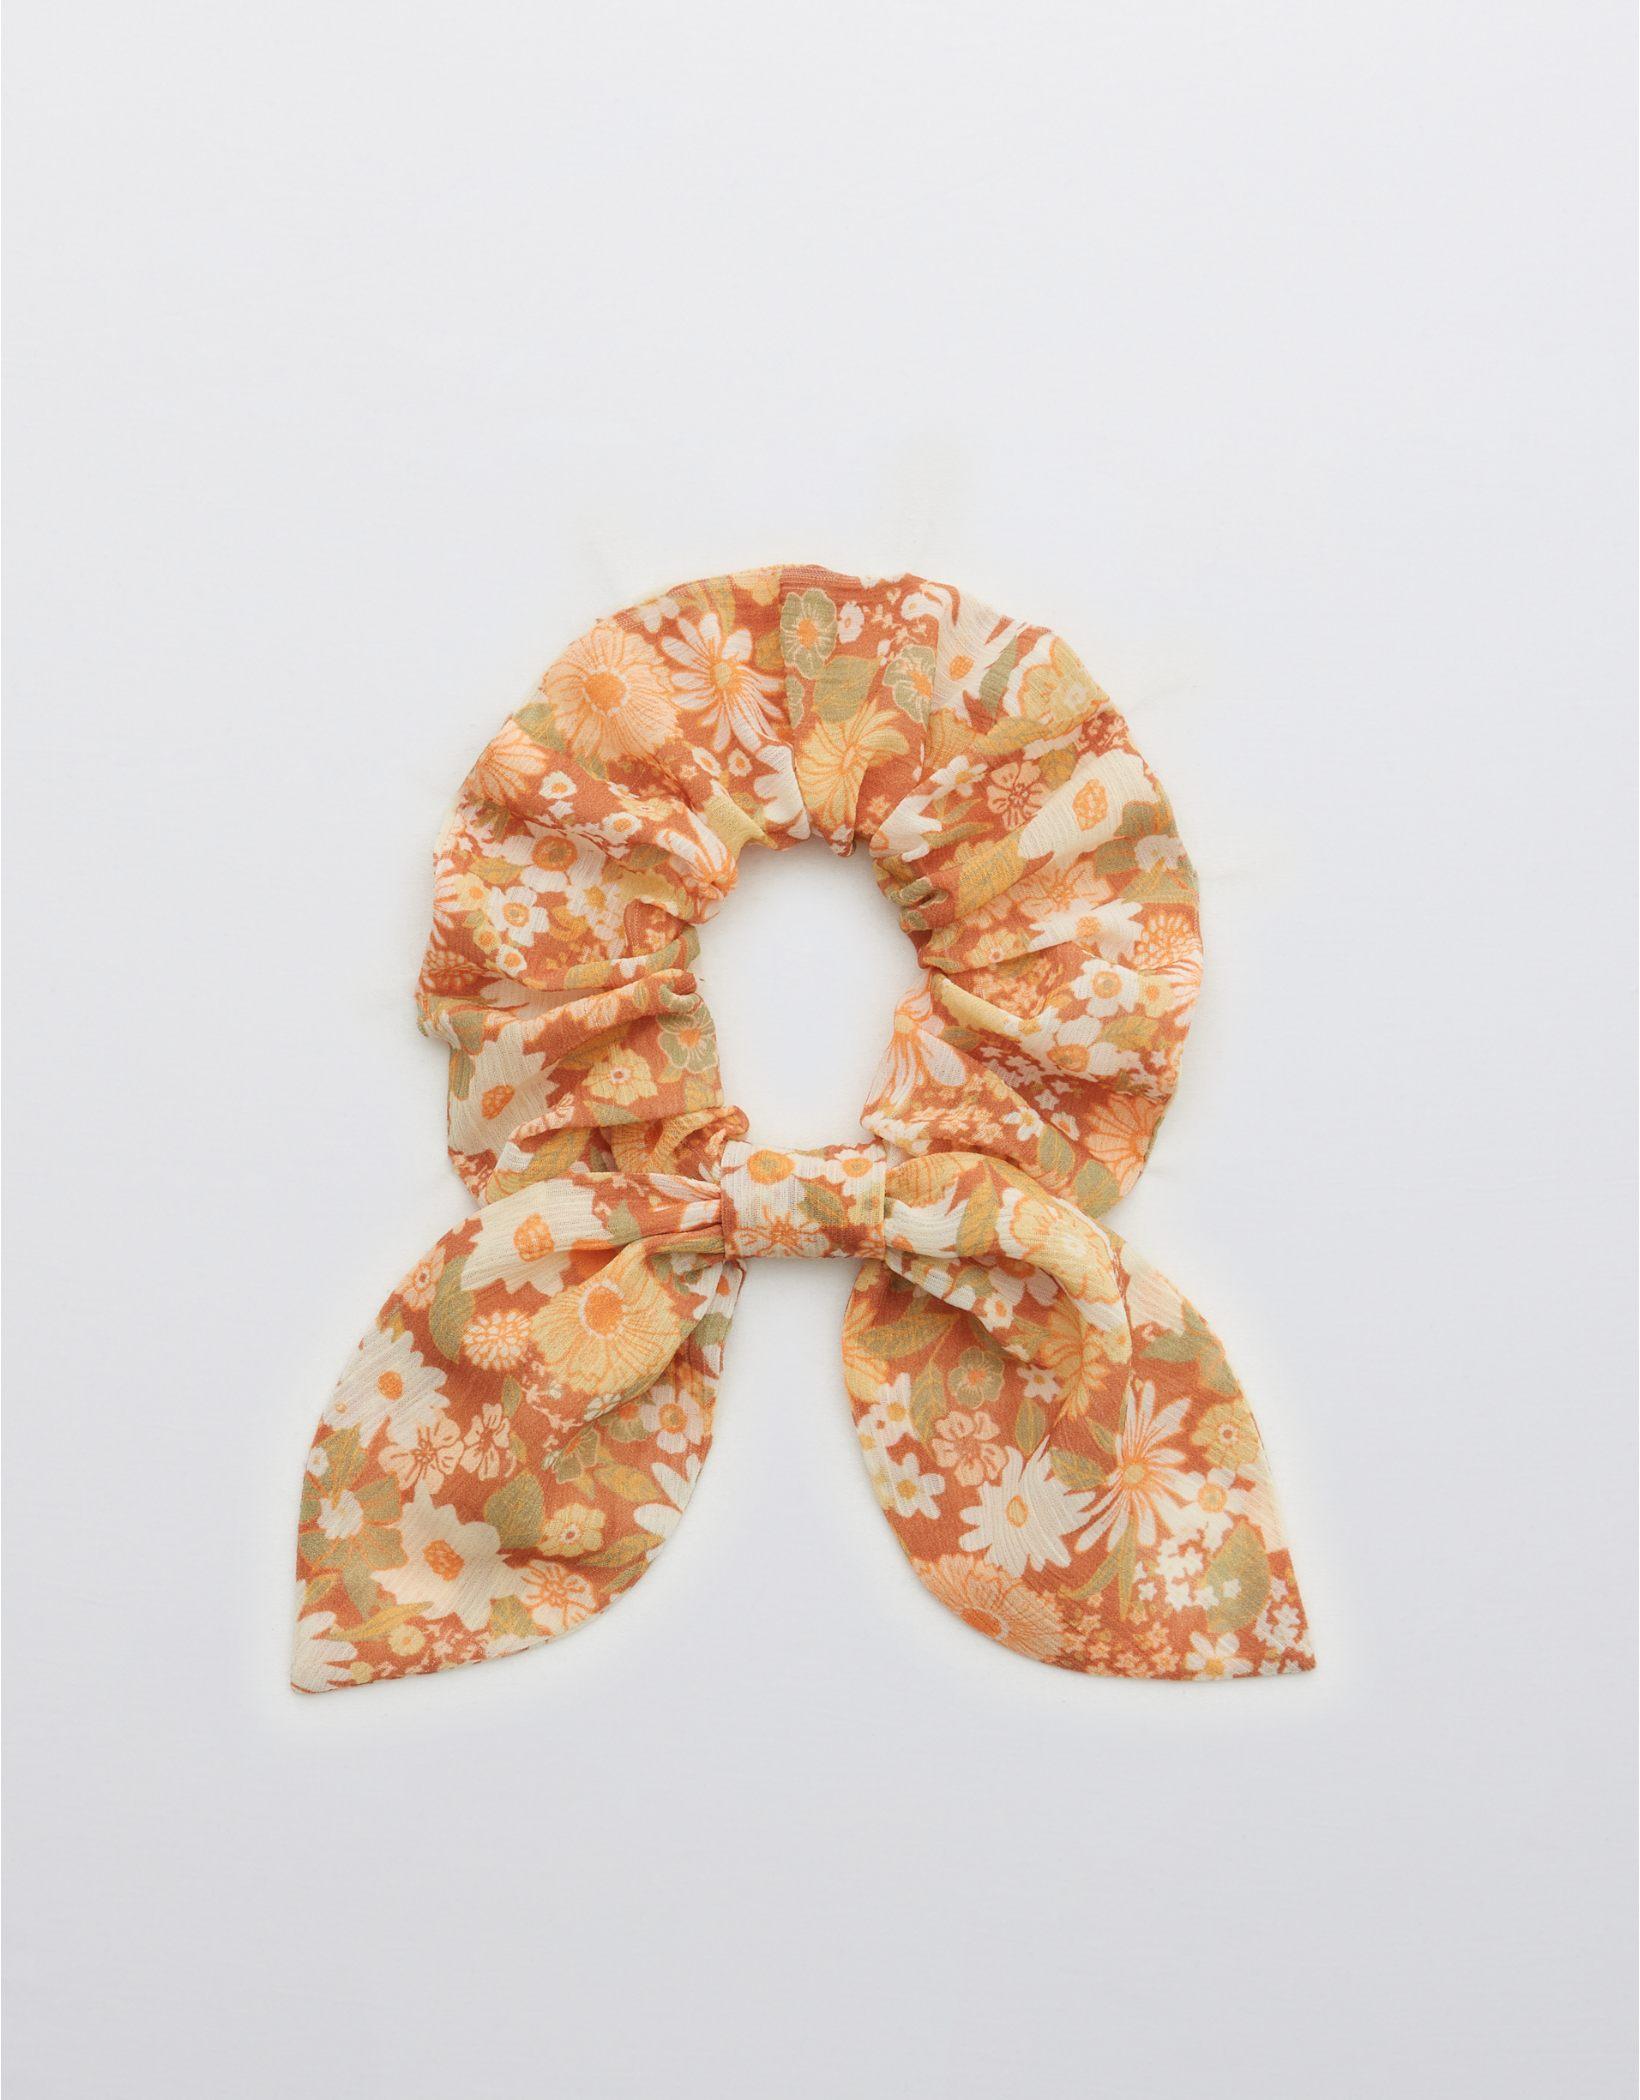 Aerie Chiffon Bow Scrunchie